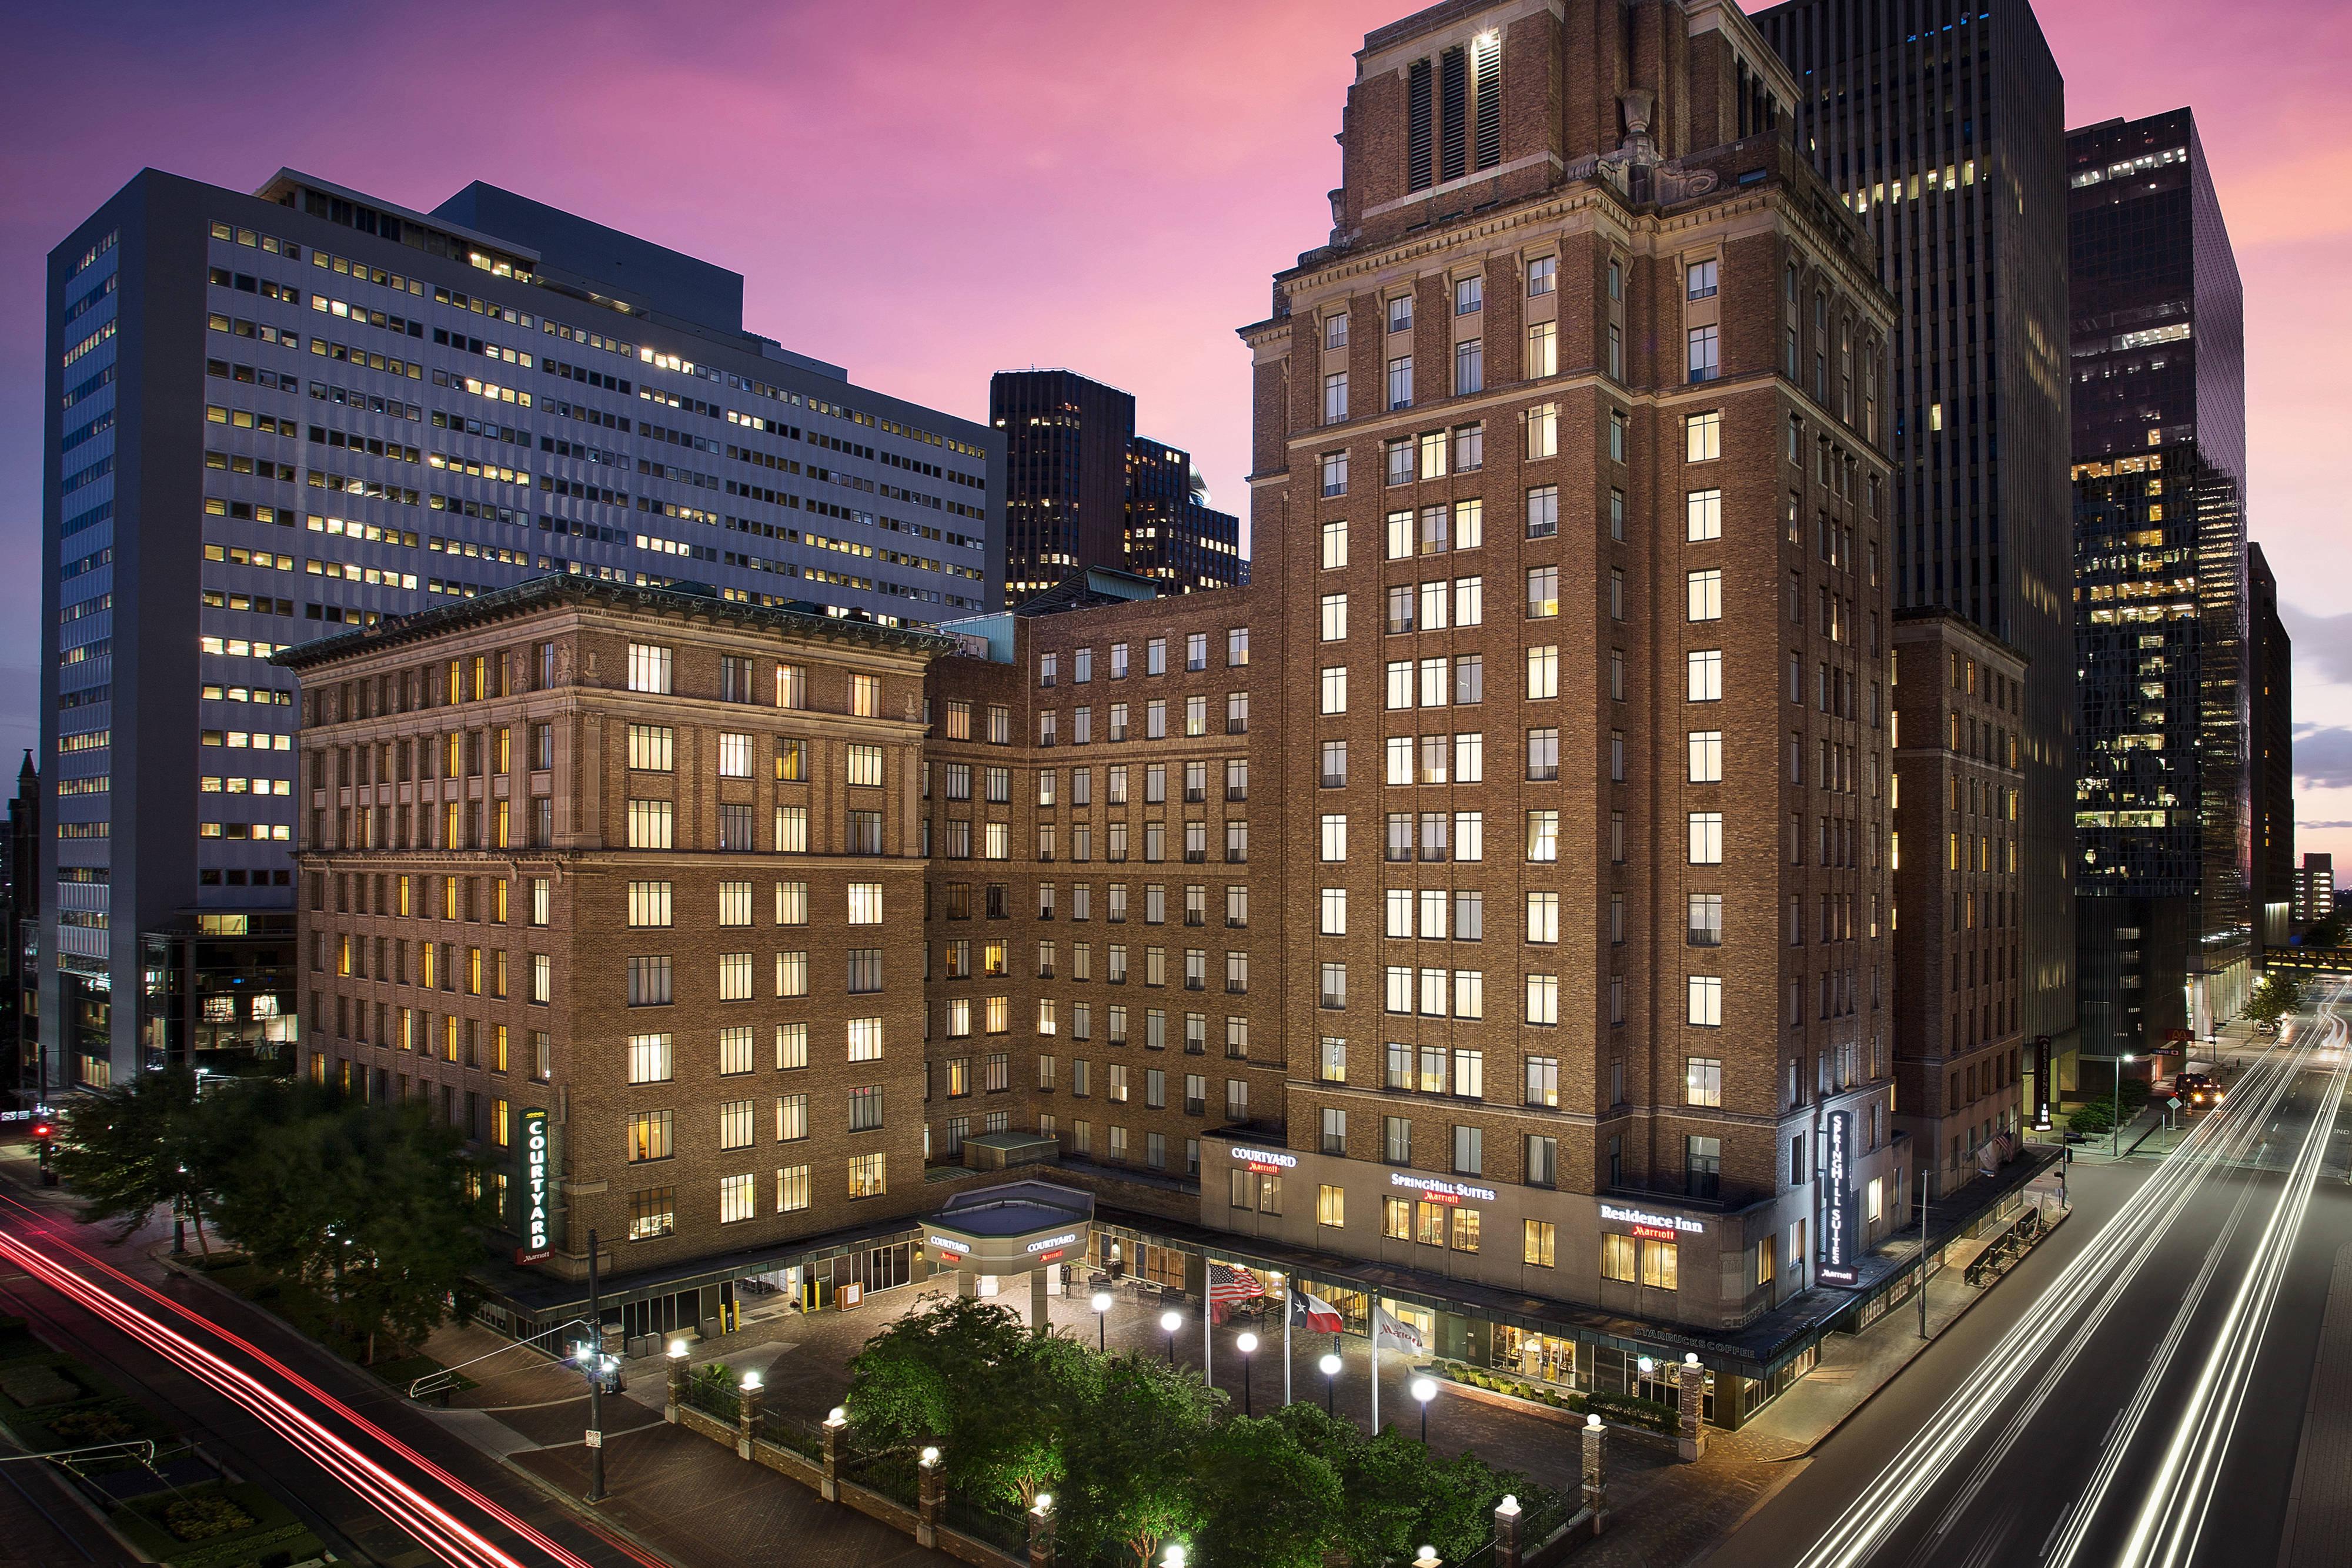 SpringHill Suites Houston Downtown